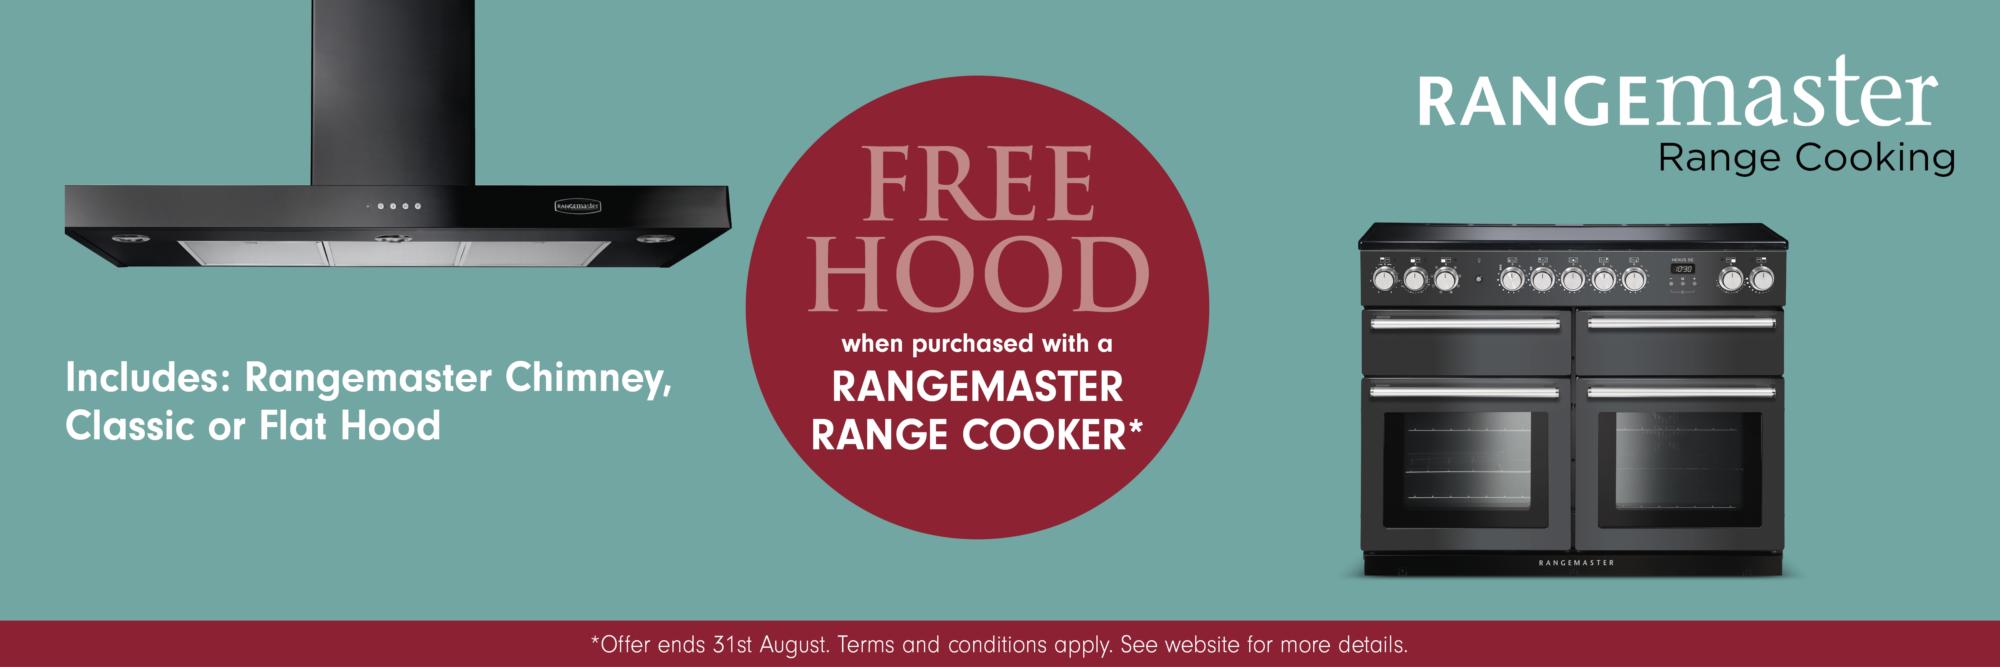 Rangemaster offer